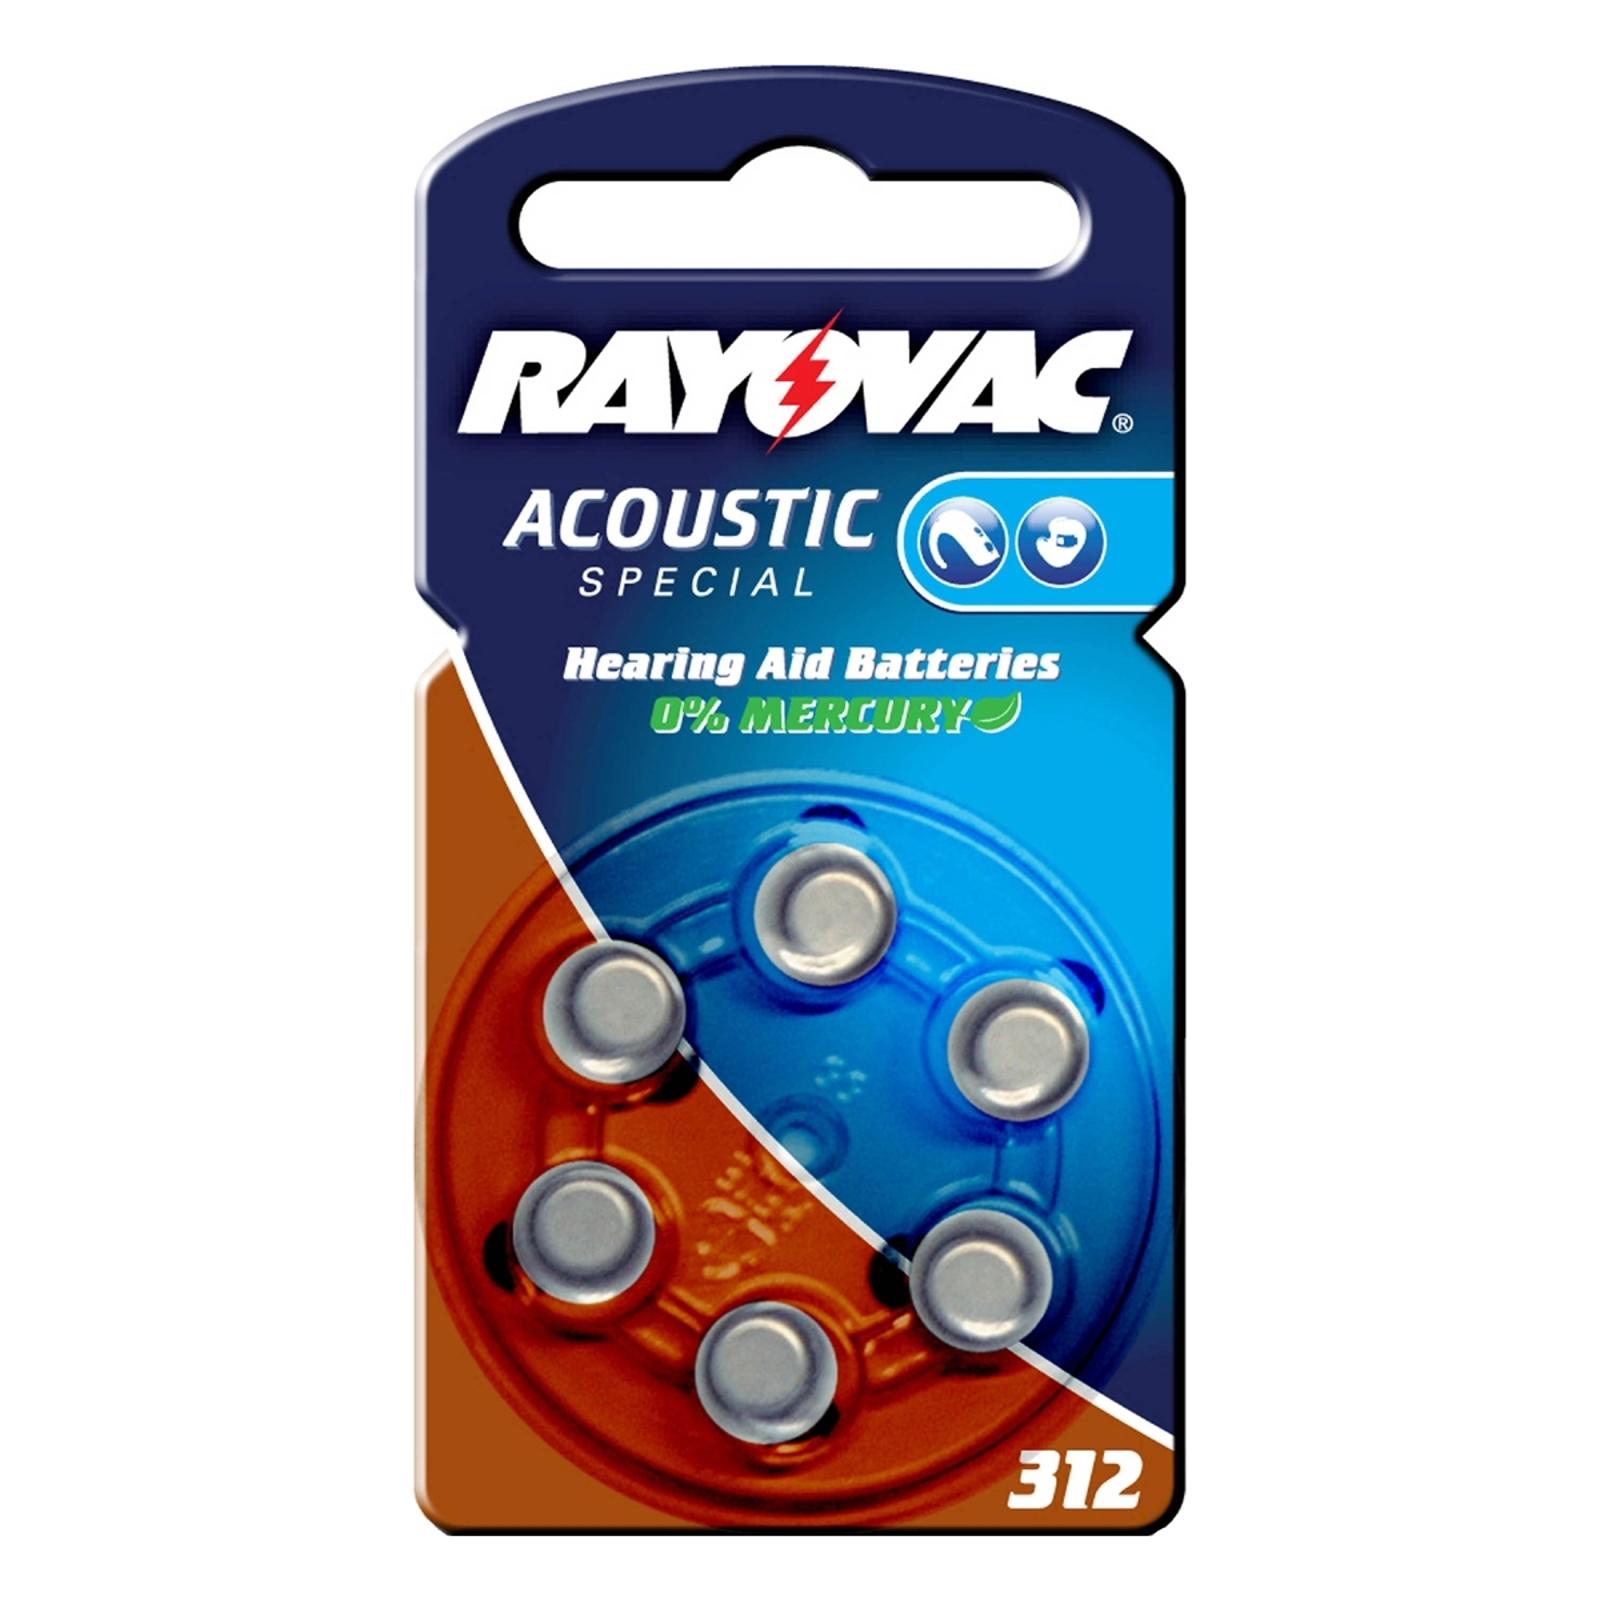 Knopfzelle Rayovac 312 Acoustic 1,4V, 180m/Ah